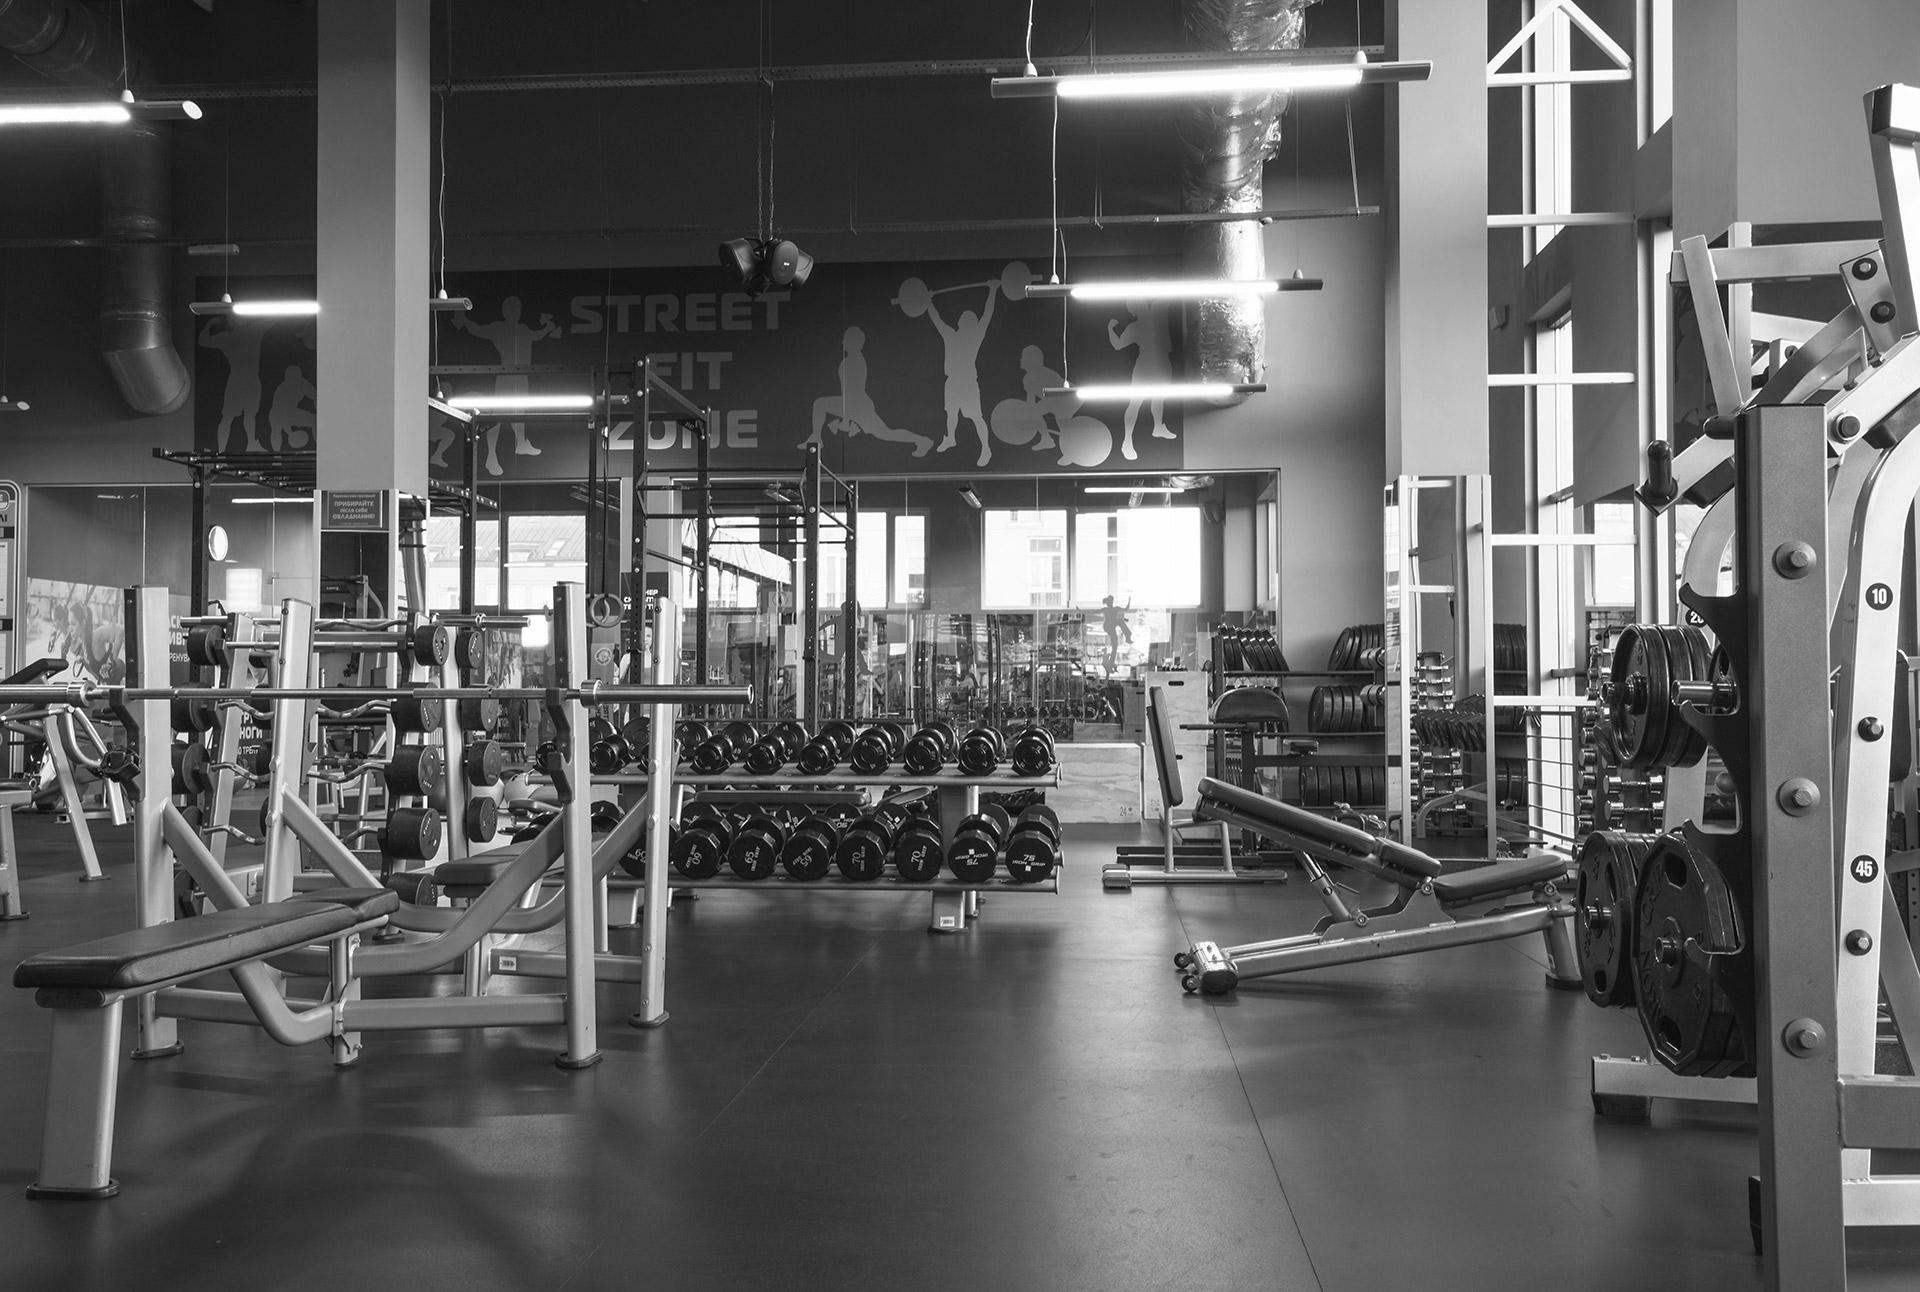 DSGVO Fitness-Studio